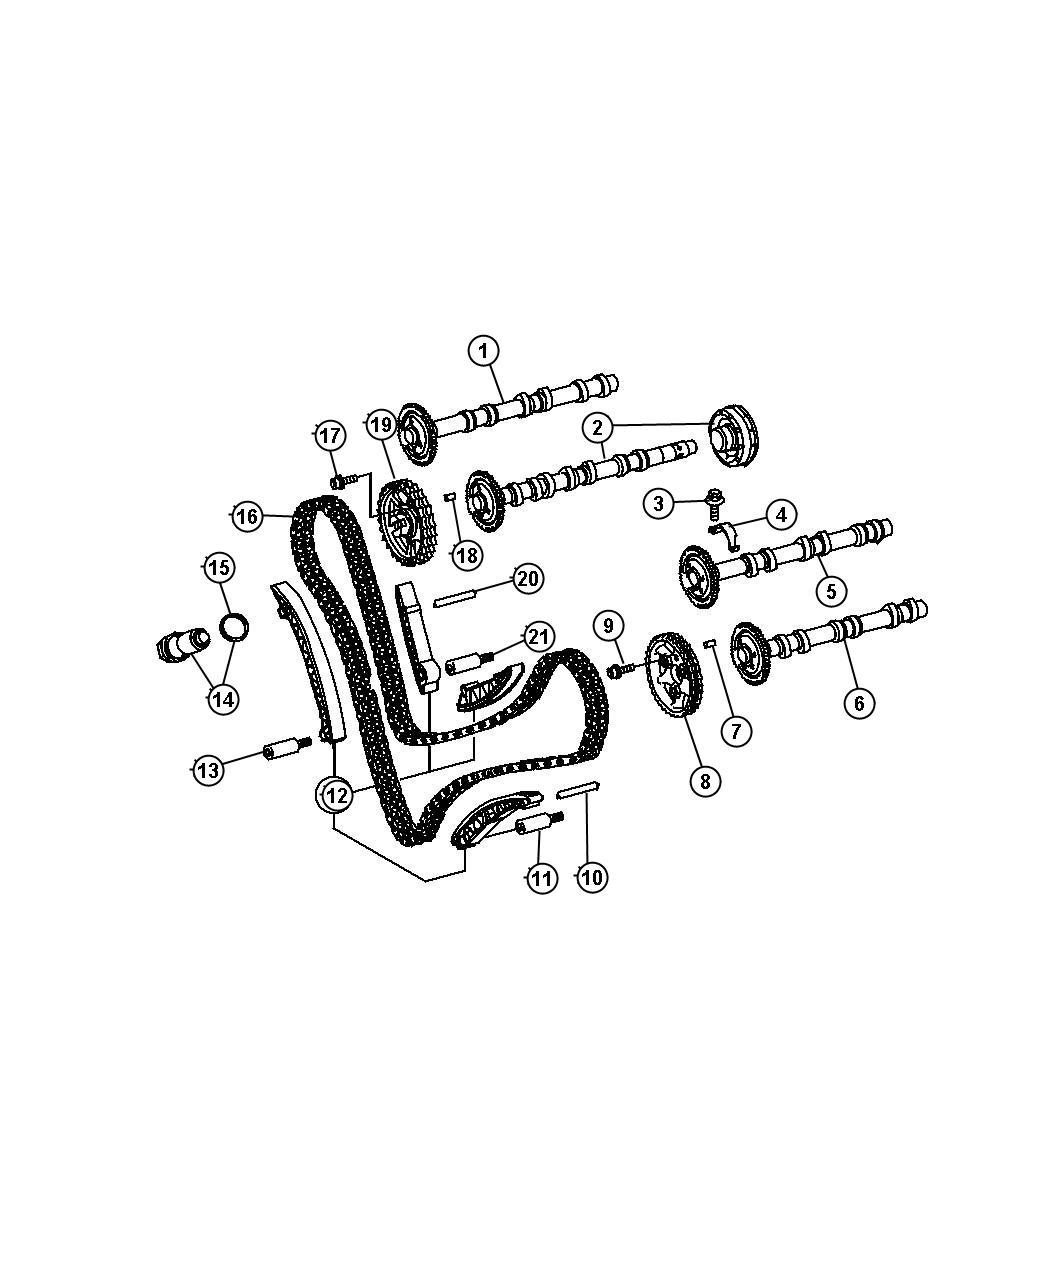 2008 Dodge Sprinter 2500 Dowel pin, pin. Sliding rail to